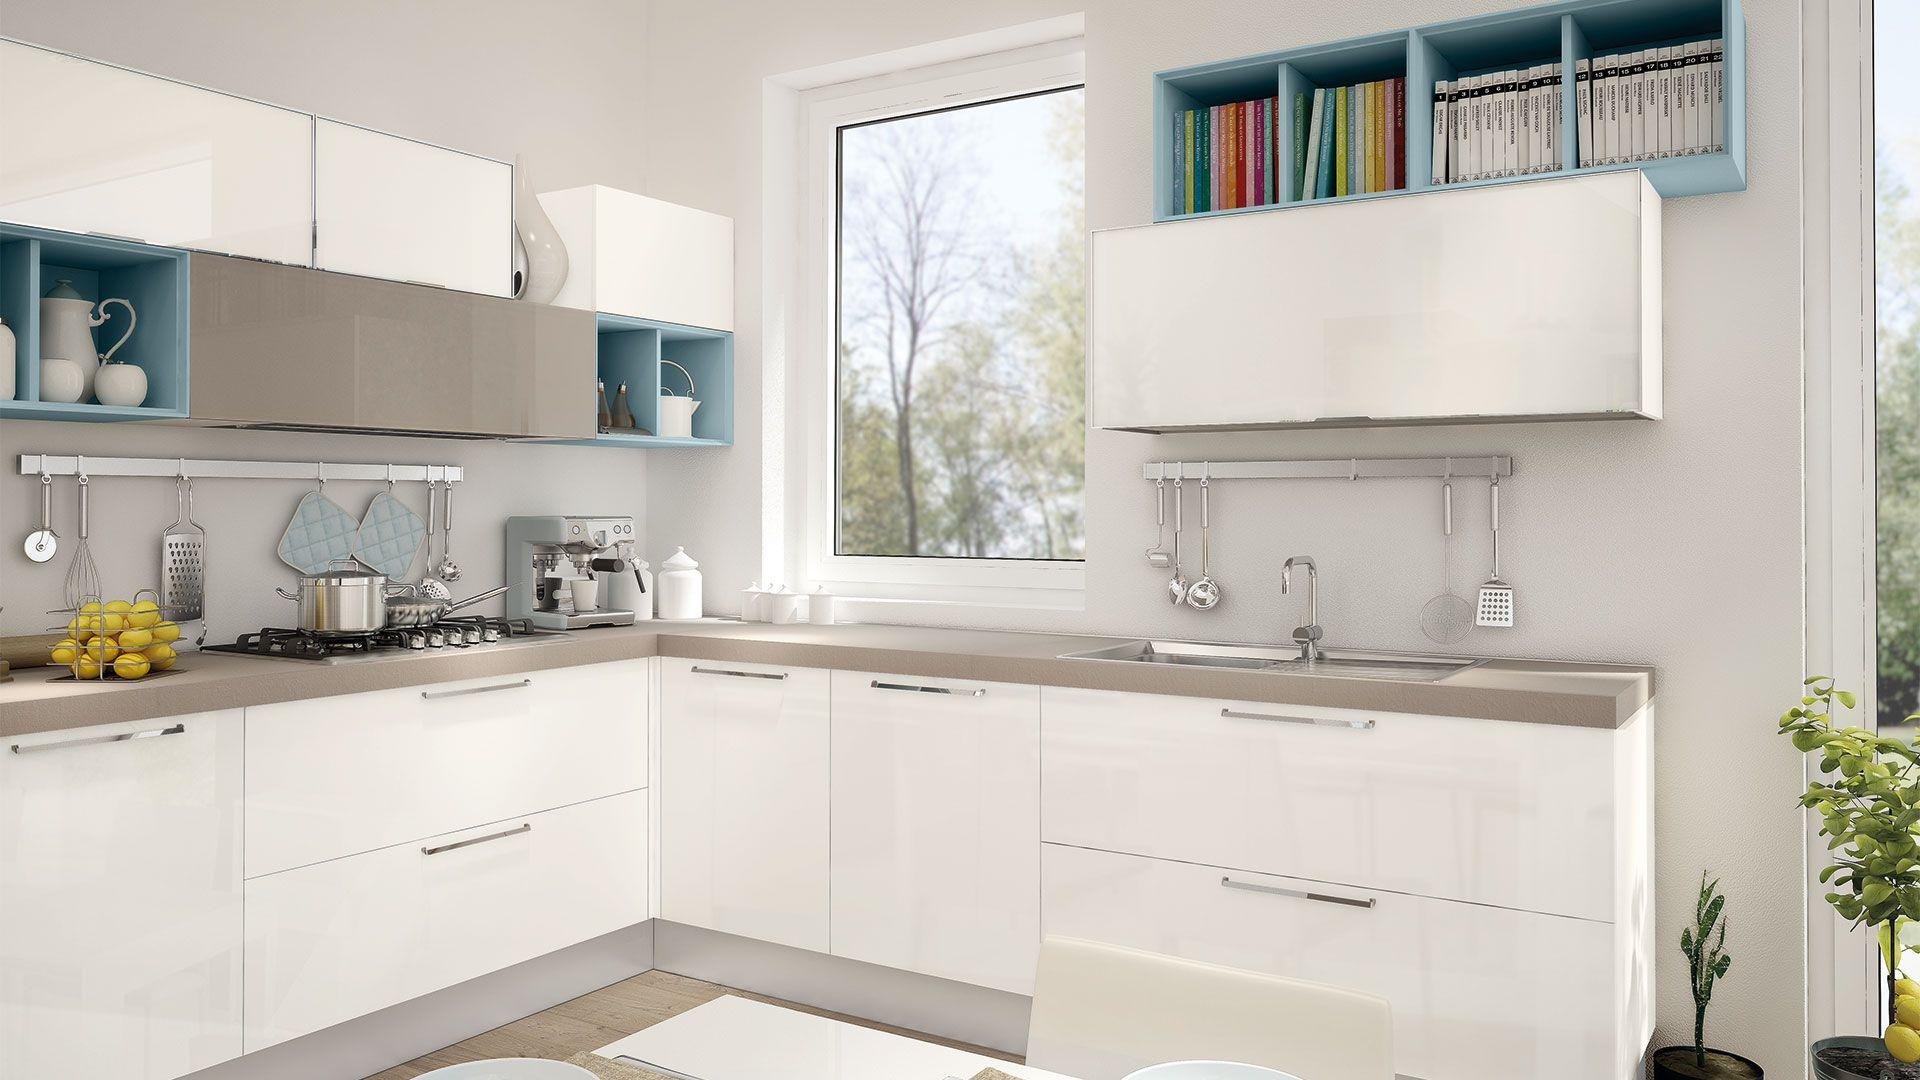 Noemi - Cucine Moderne - Cucine Lube | casa dolce casa | Pinterest